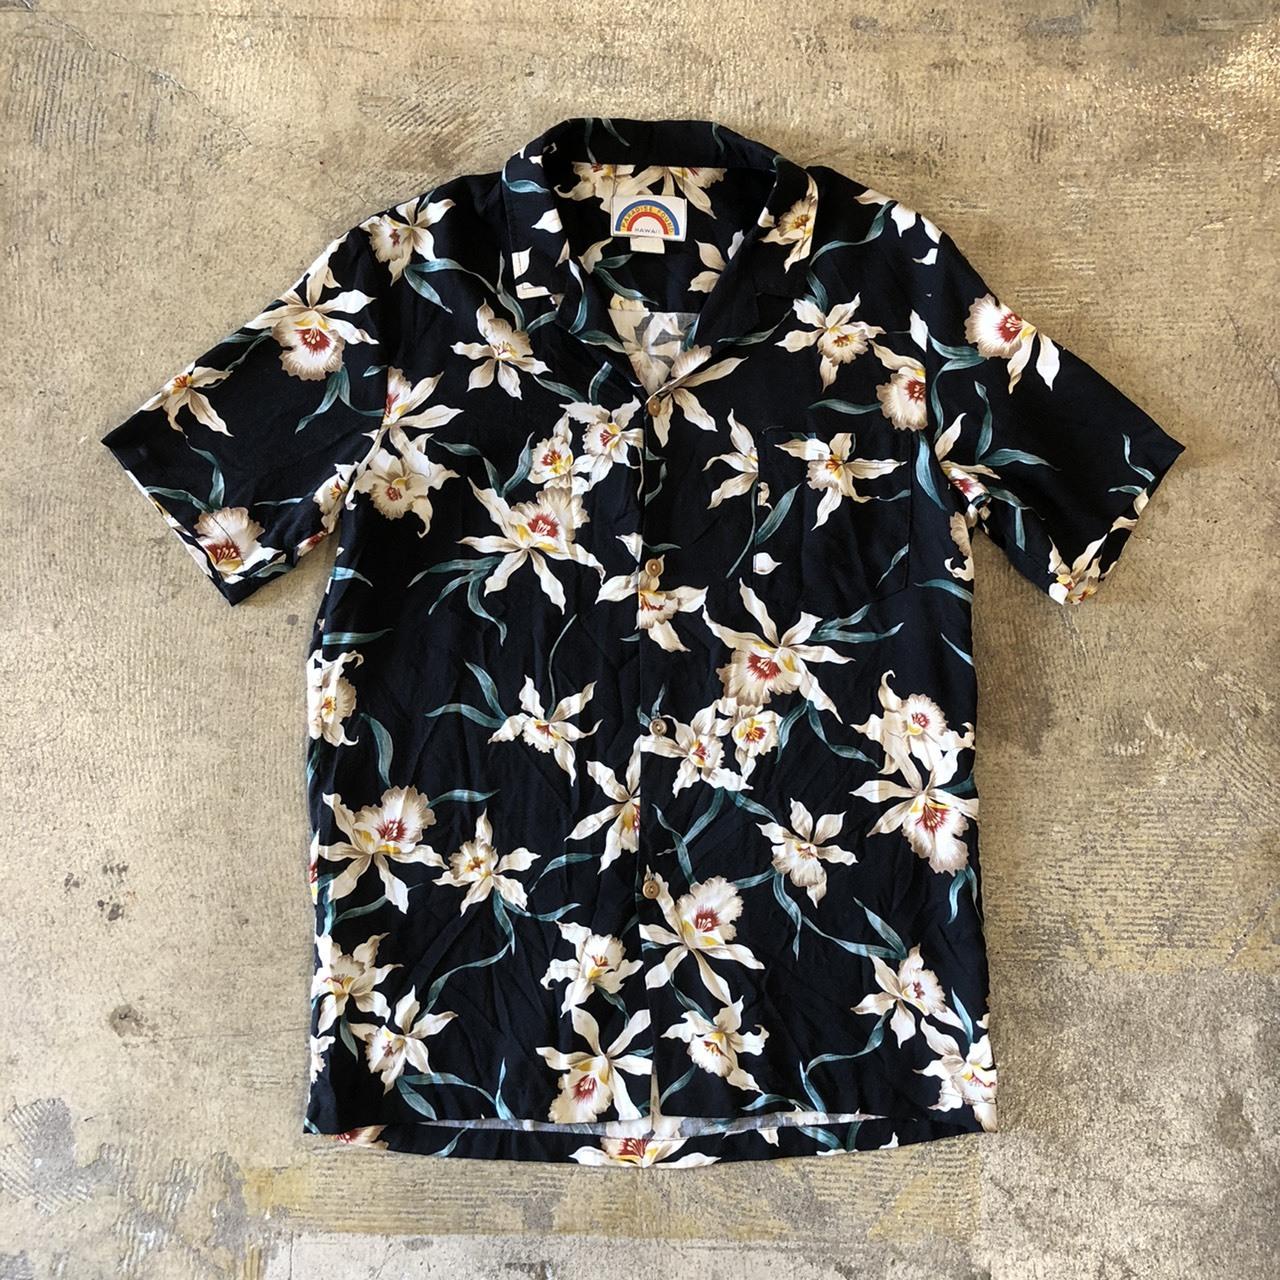 Paradice Found Floral Aloha Shirts ¥5,800+tax